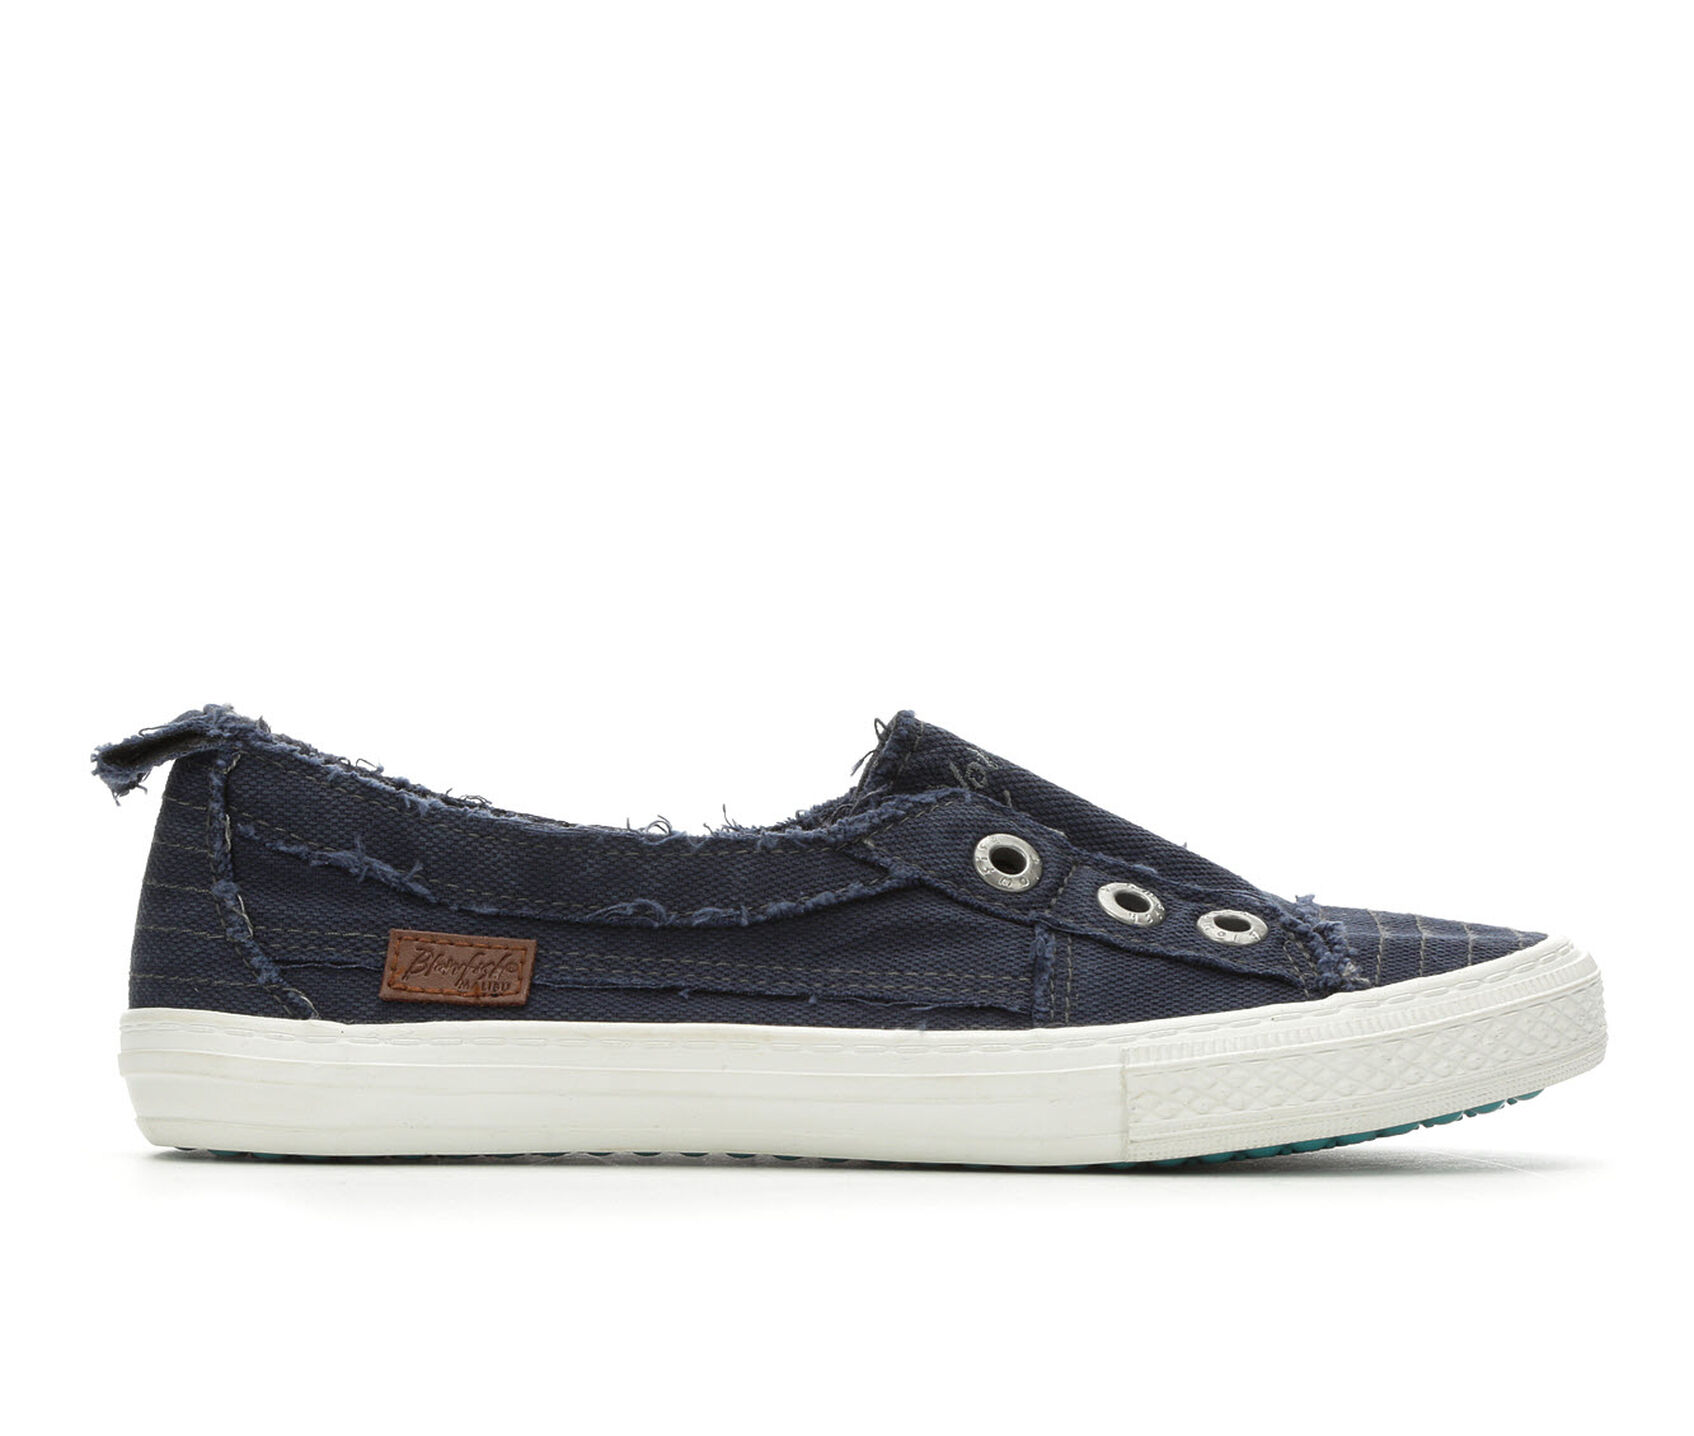 0f0ecc9ebb448 Women's Blowfish Malibu Aussie Slip-On Sneakers